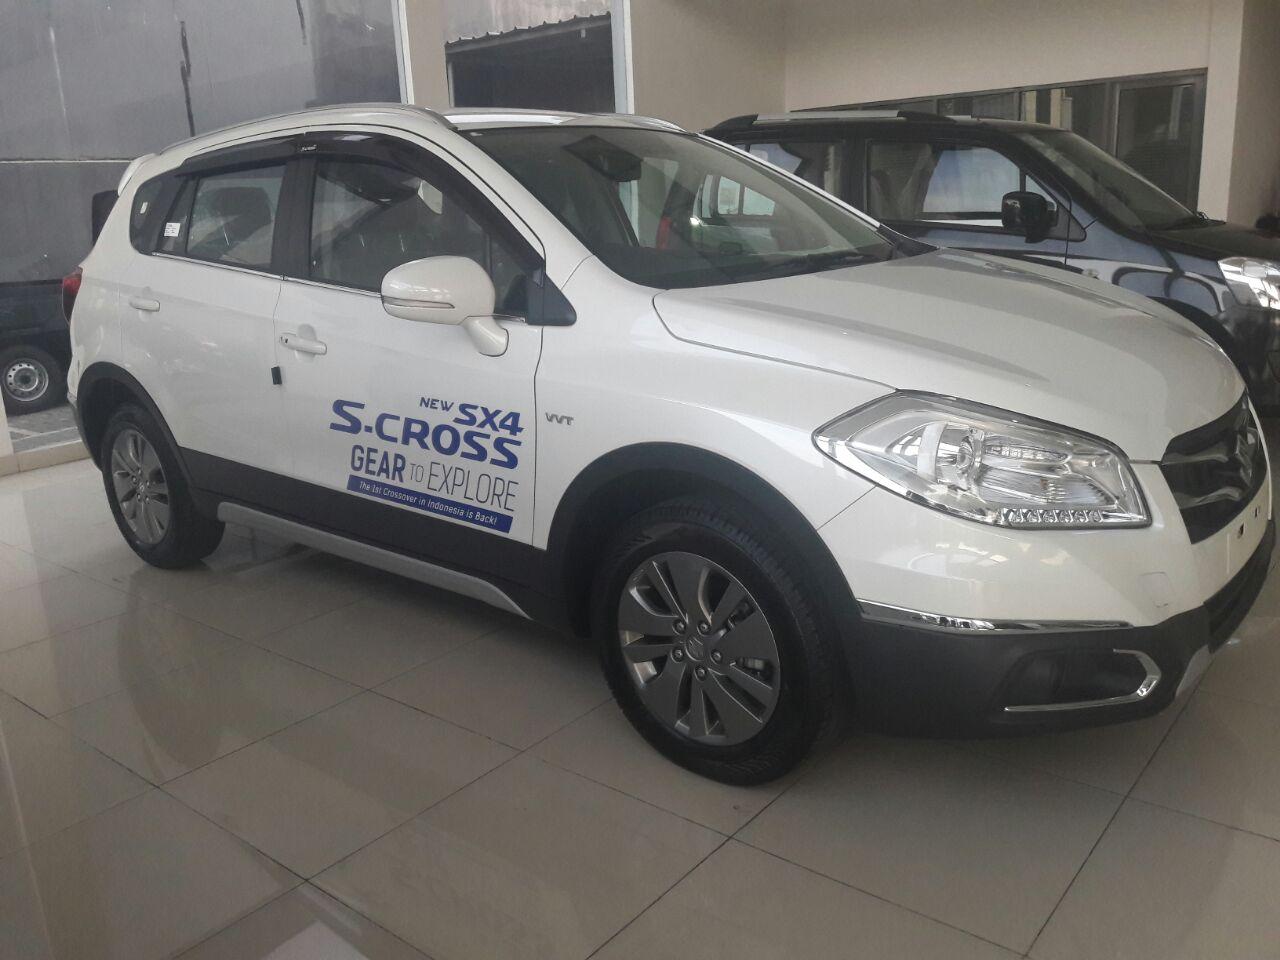 Suzuki S-Cross test drive warna putih